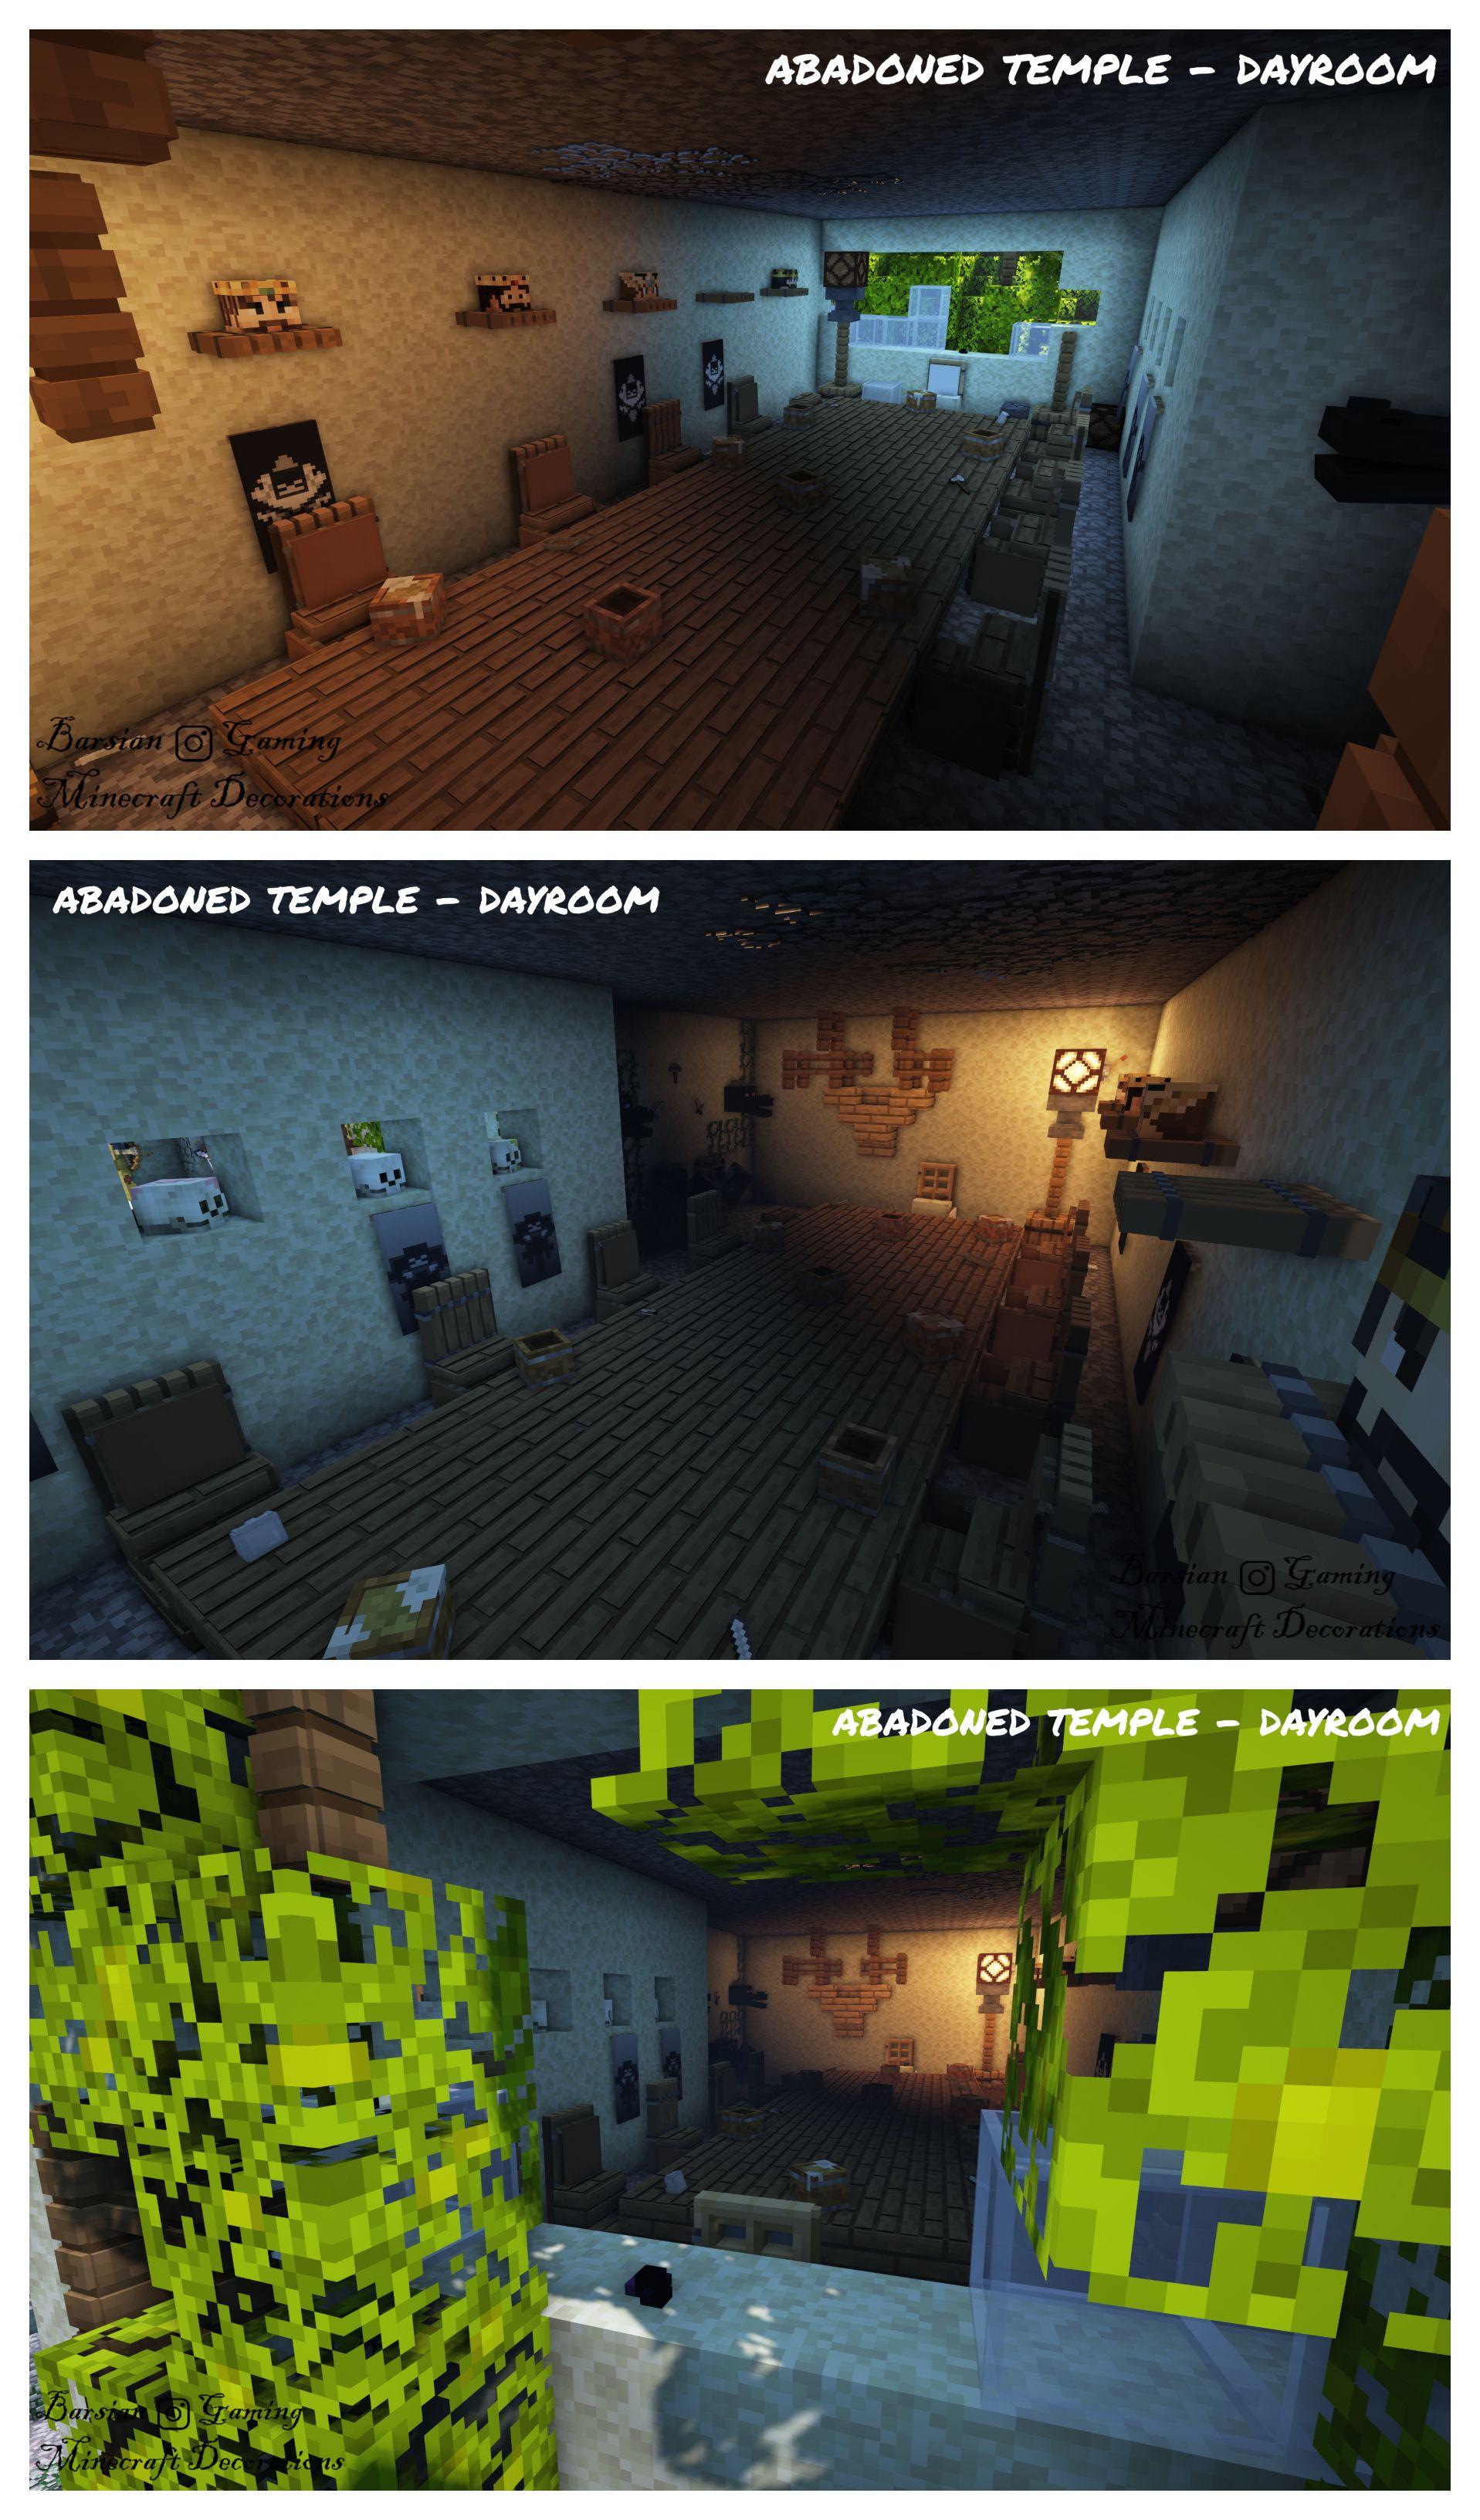 Abadoned Temple Dayroom Minecraft Designs Minecraft Architecture Minecraft